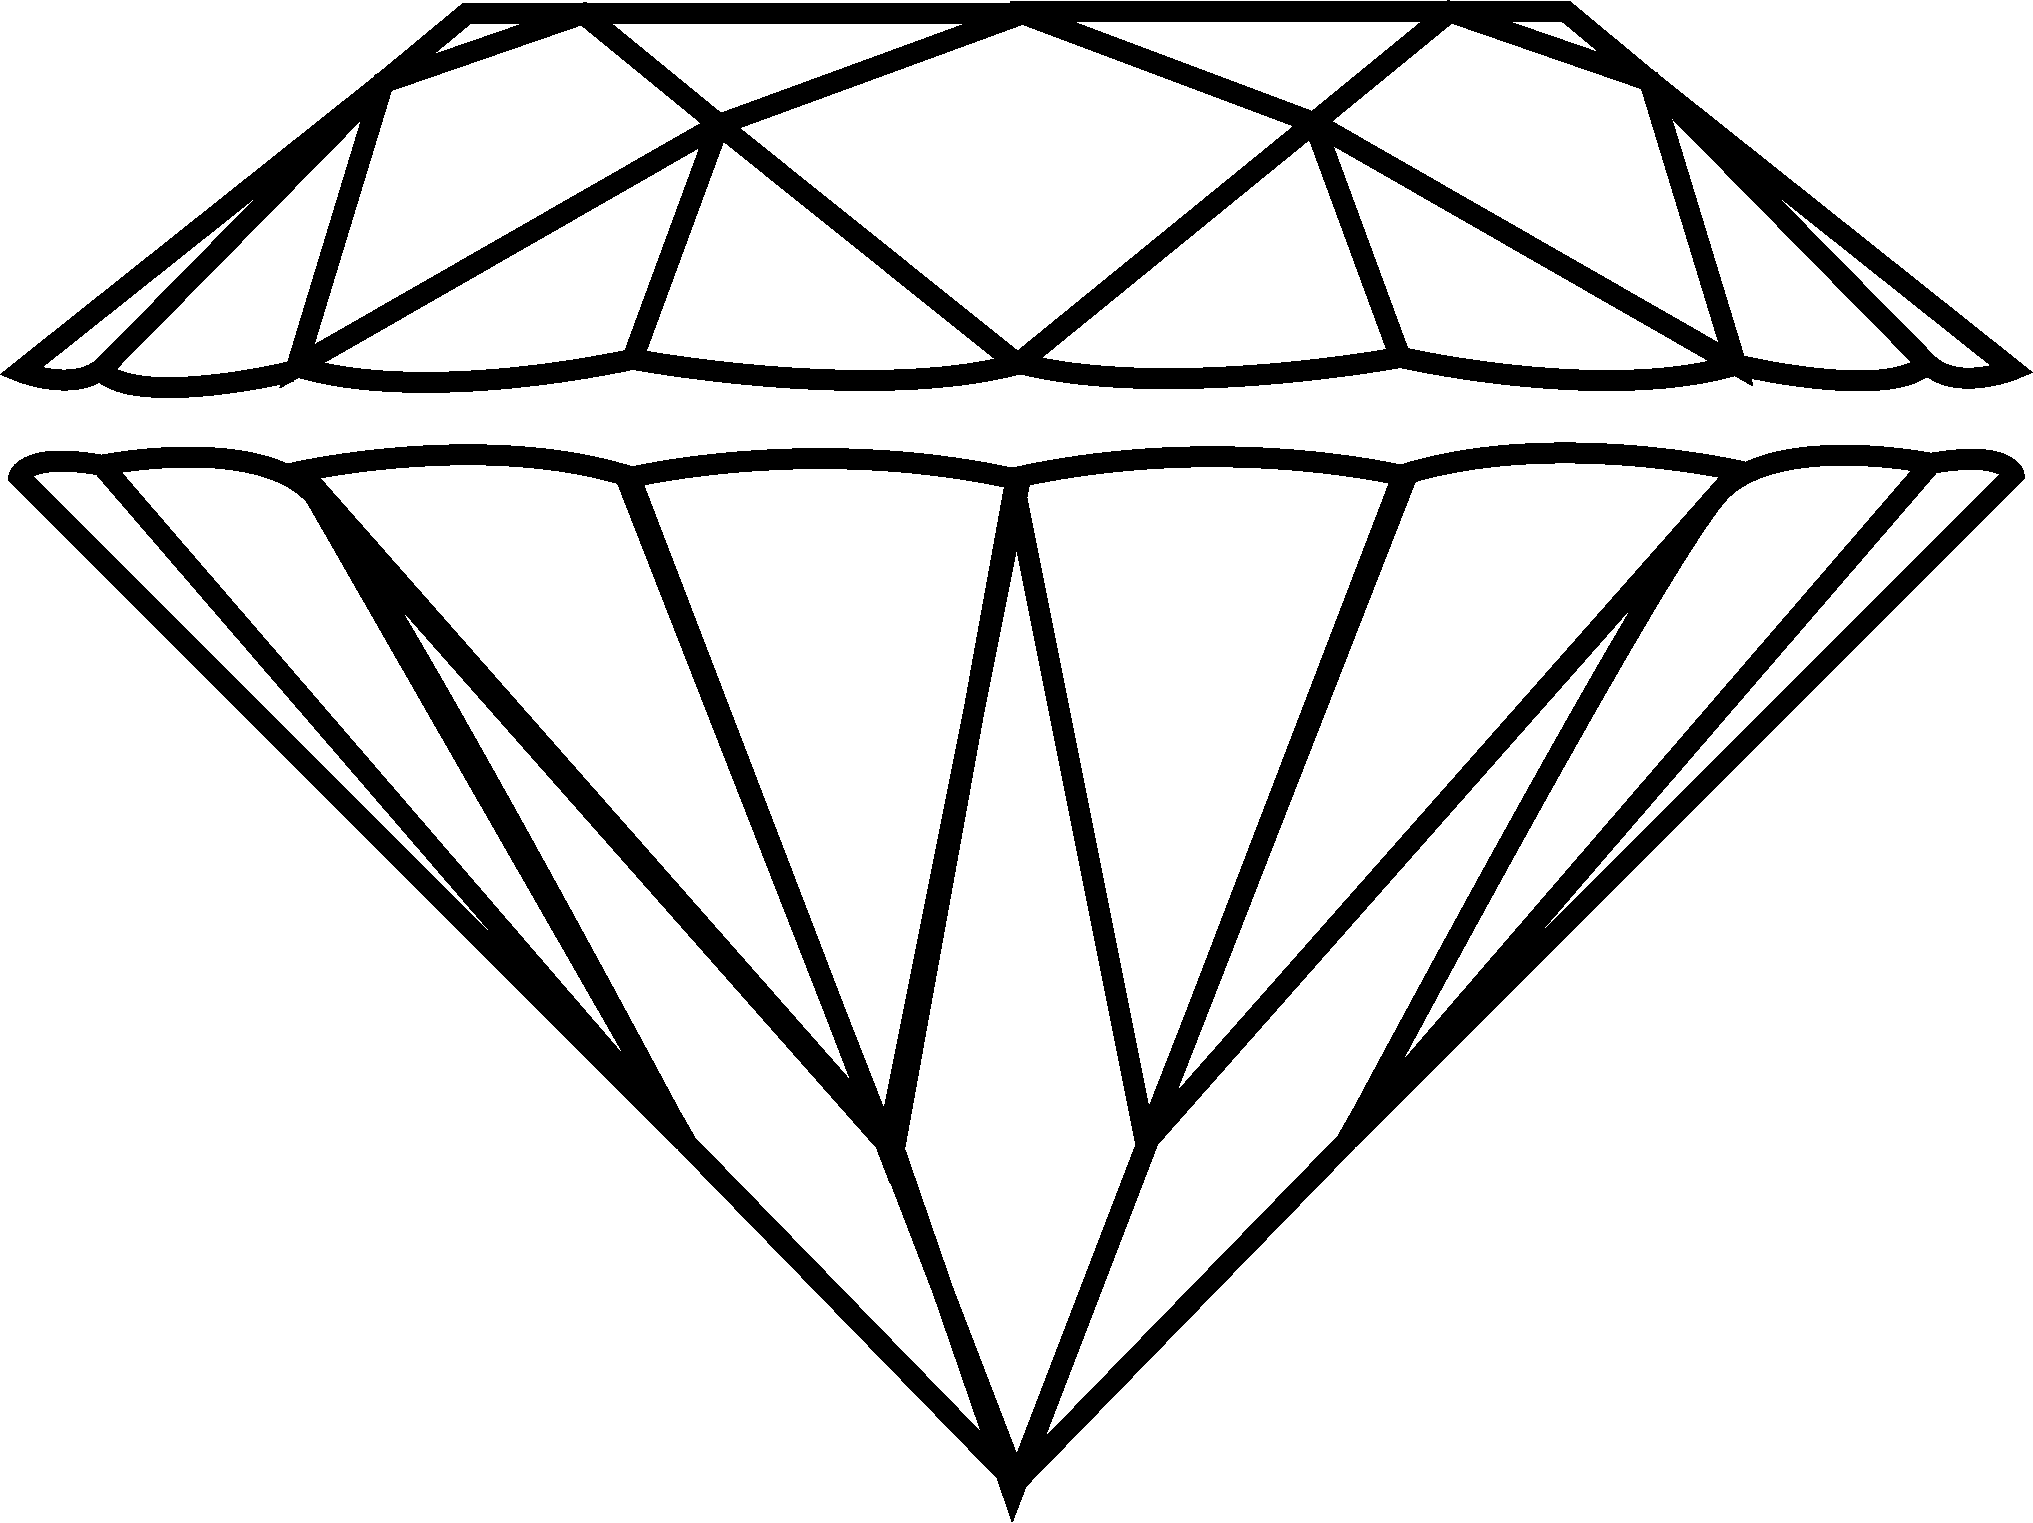 2033x1523 Sketch Clipart Diamond Outline